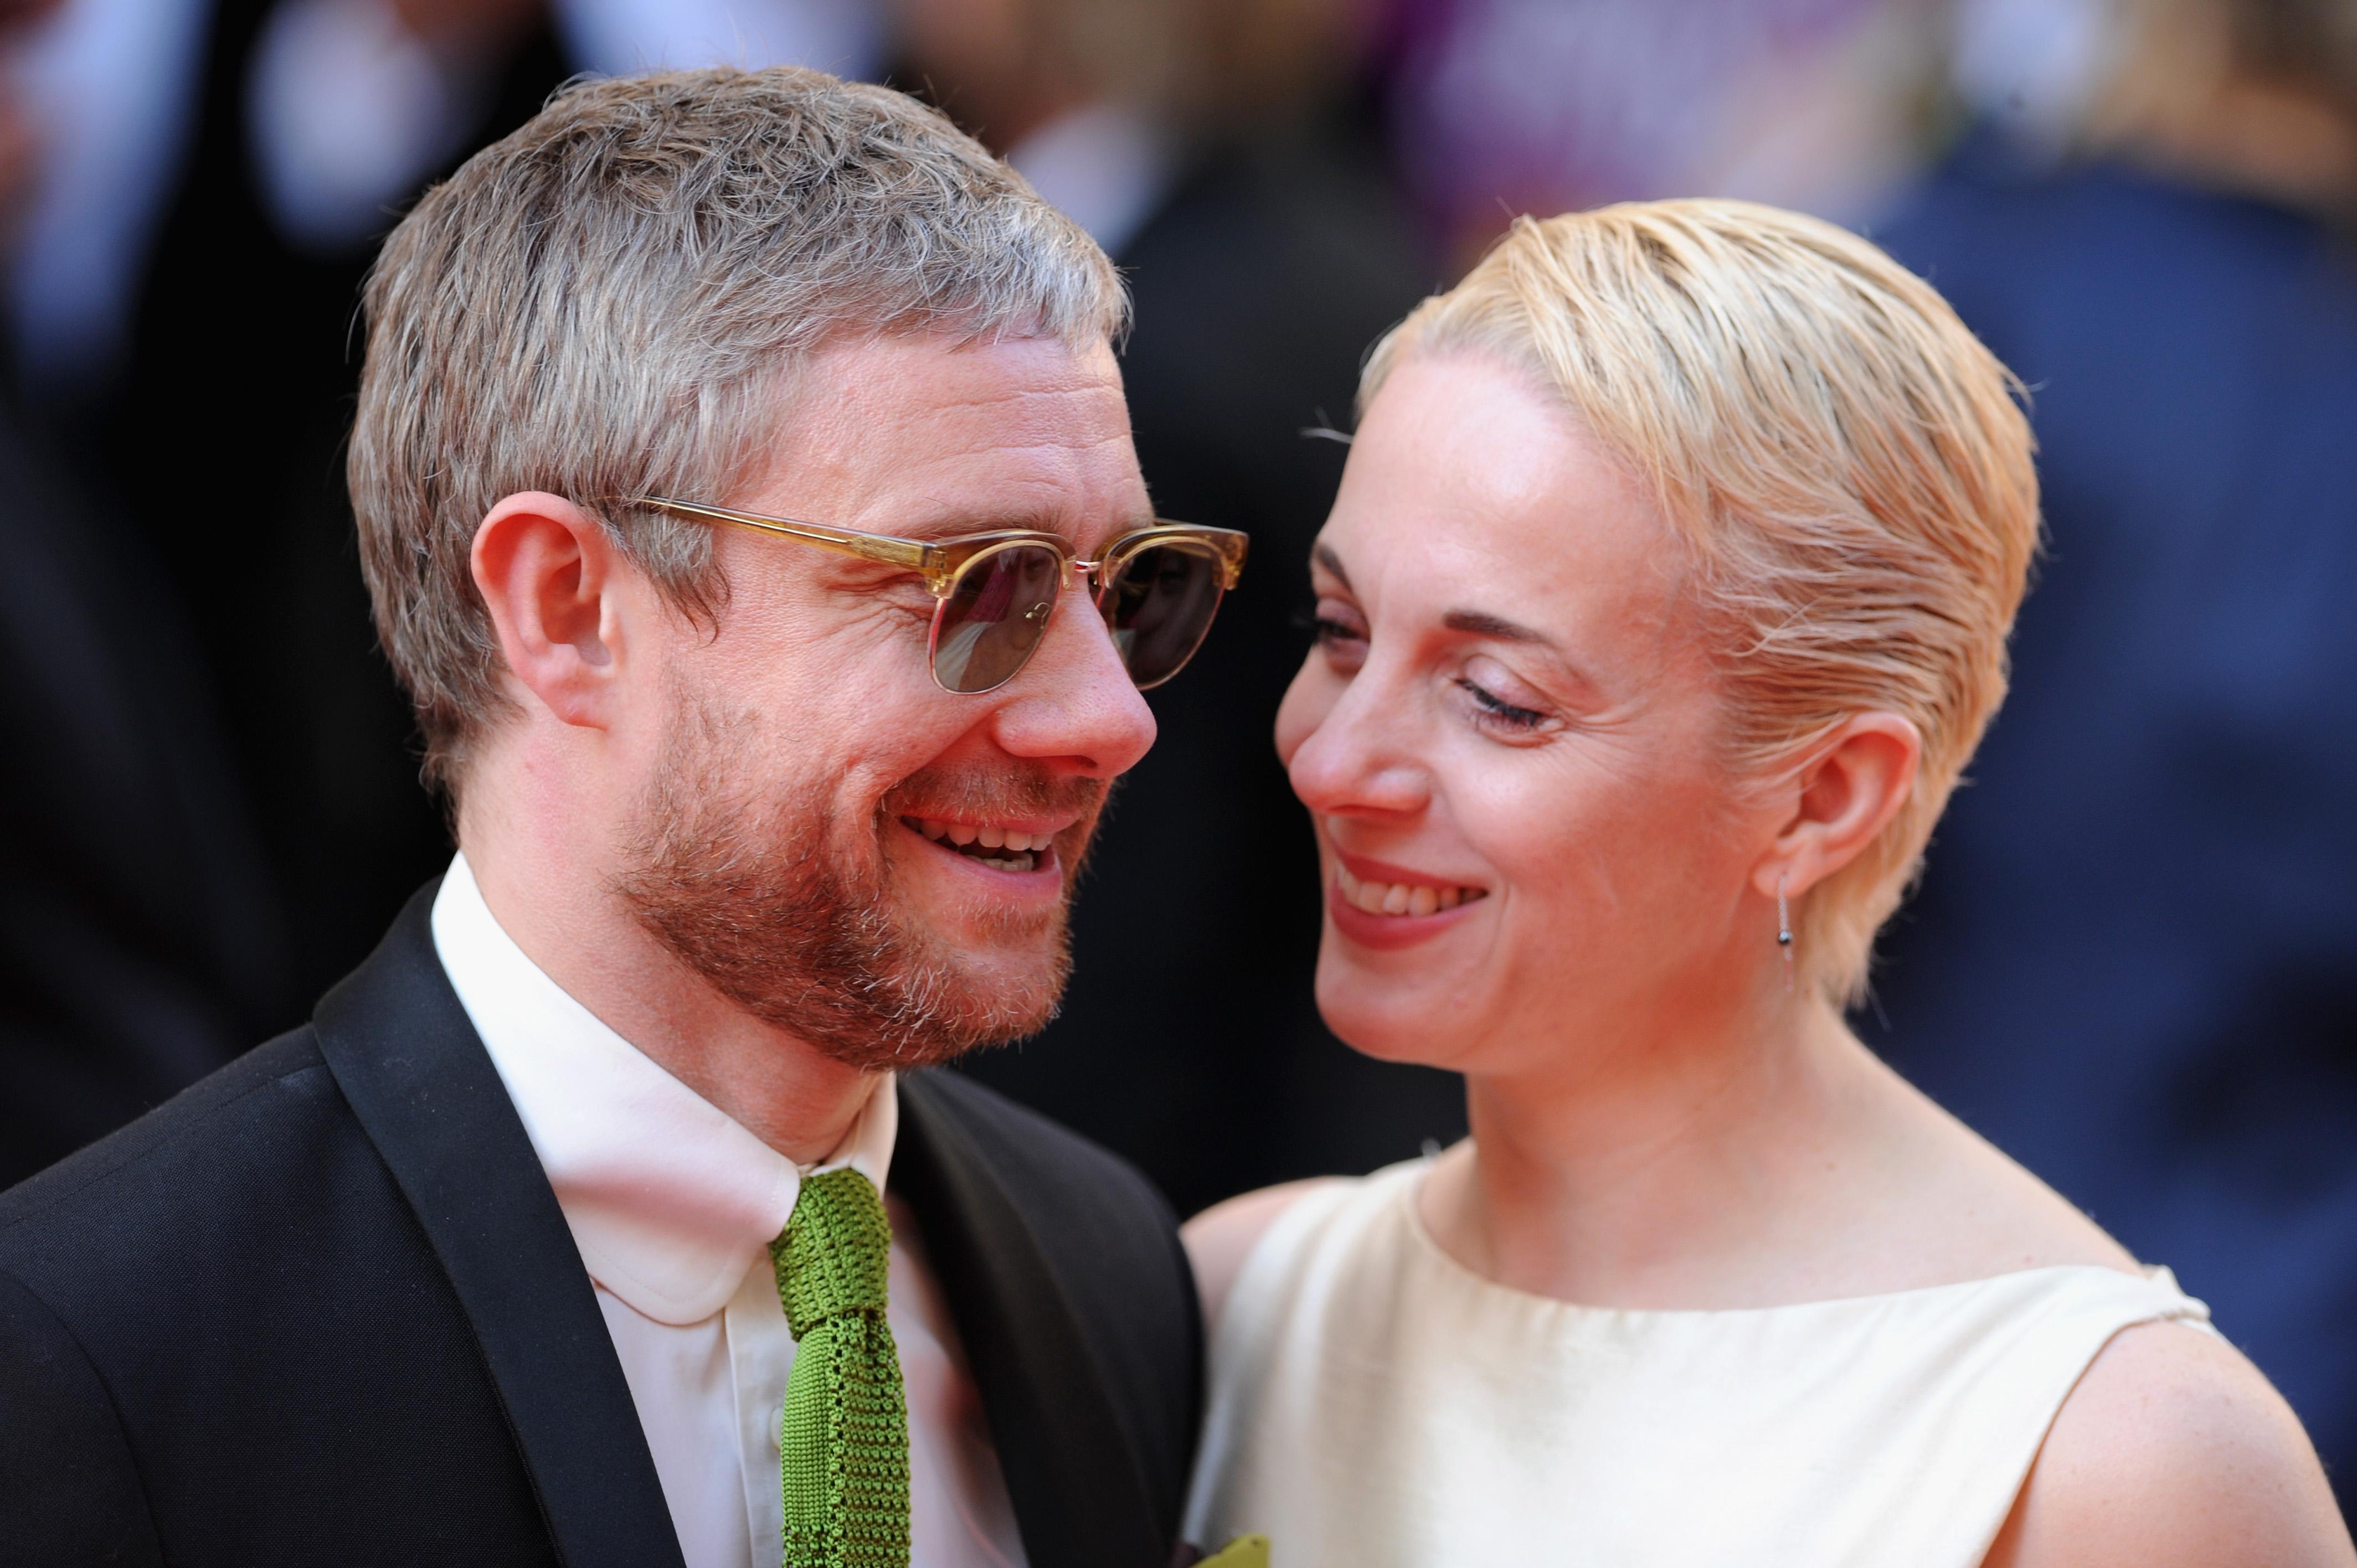 Amanda Abbington reveals heartache over Martin Freeman split and why they kept it secret for six months